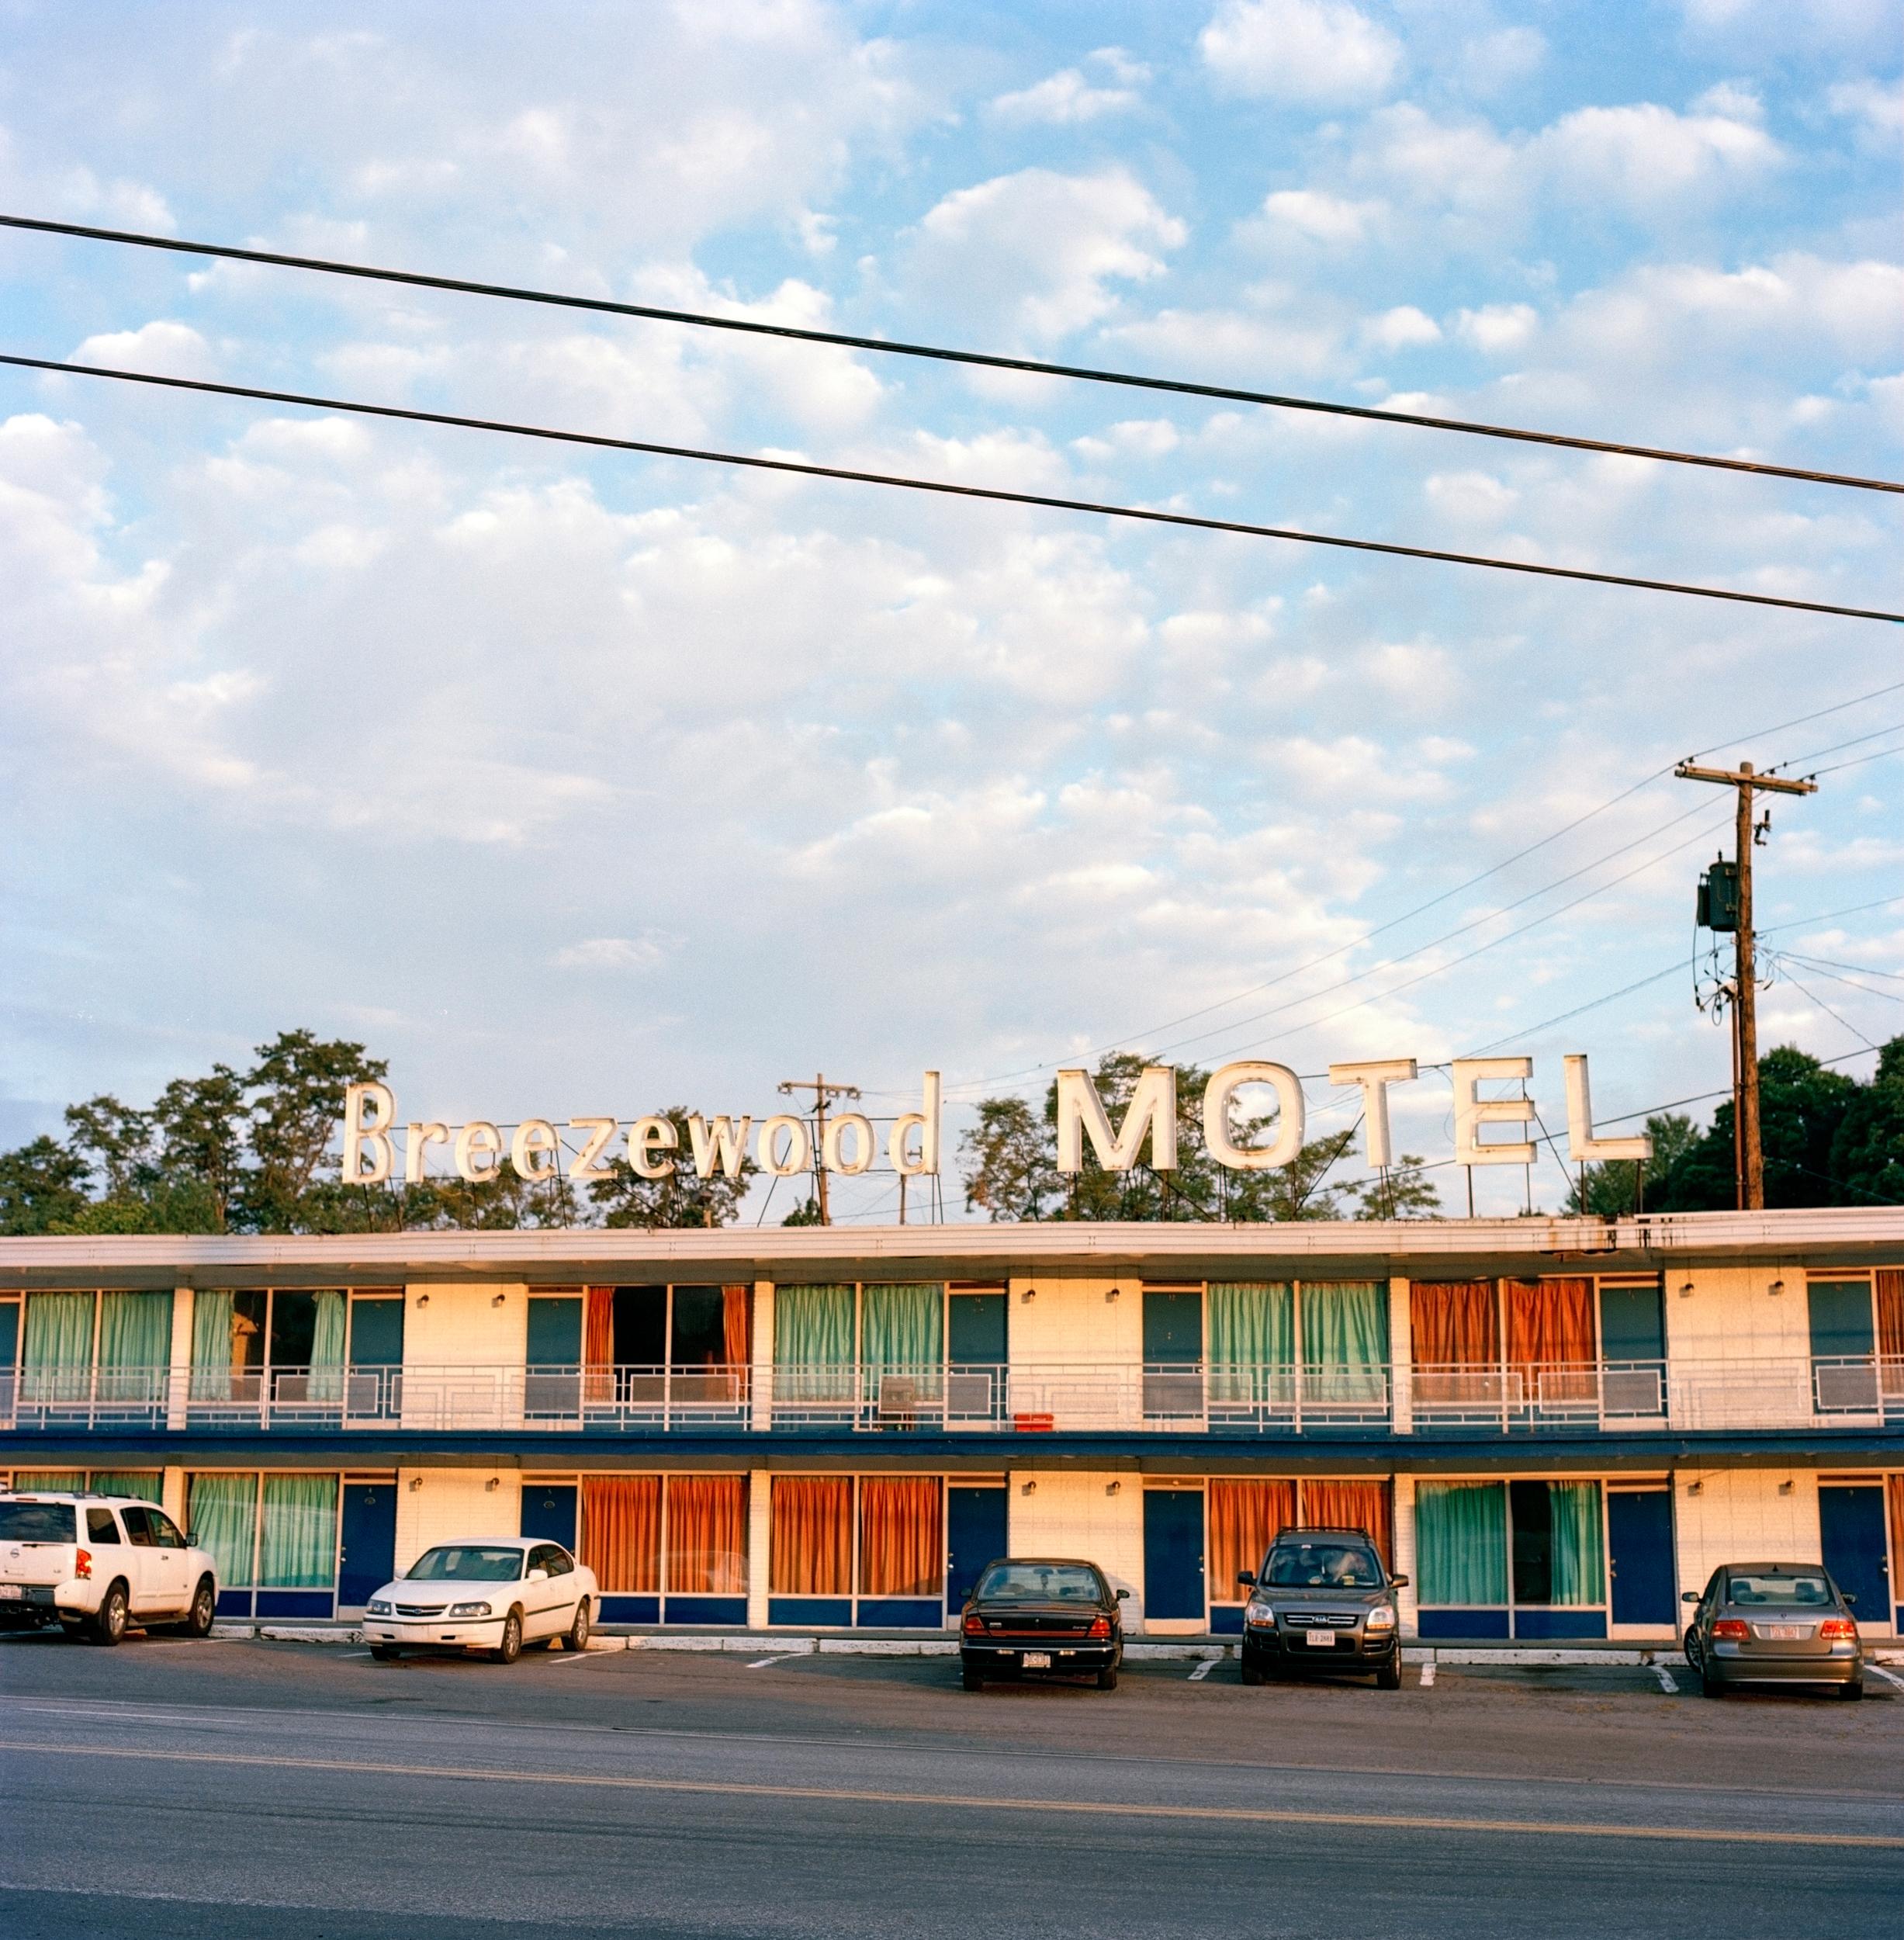 Breezewood-Motel-Sunrise.jpg